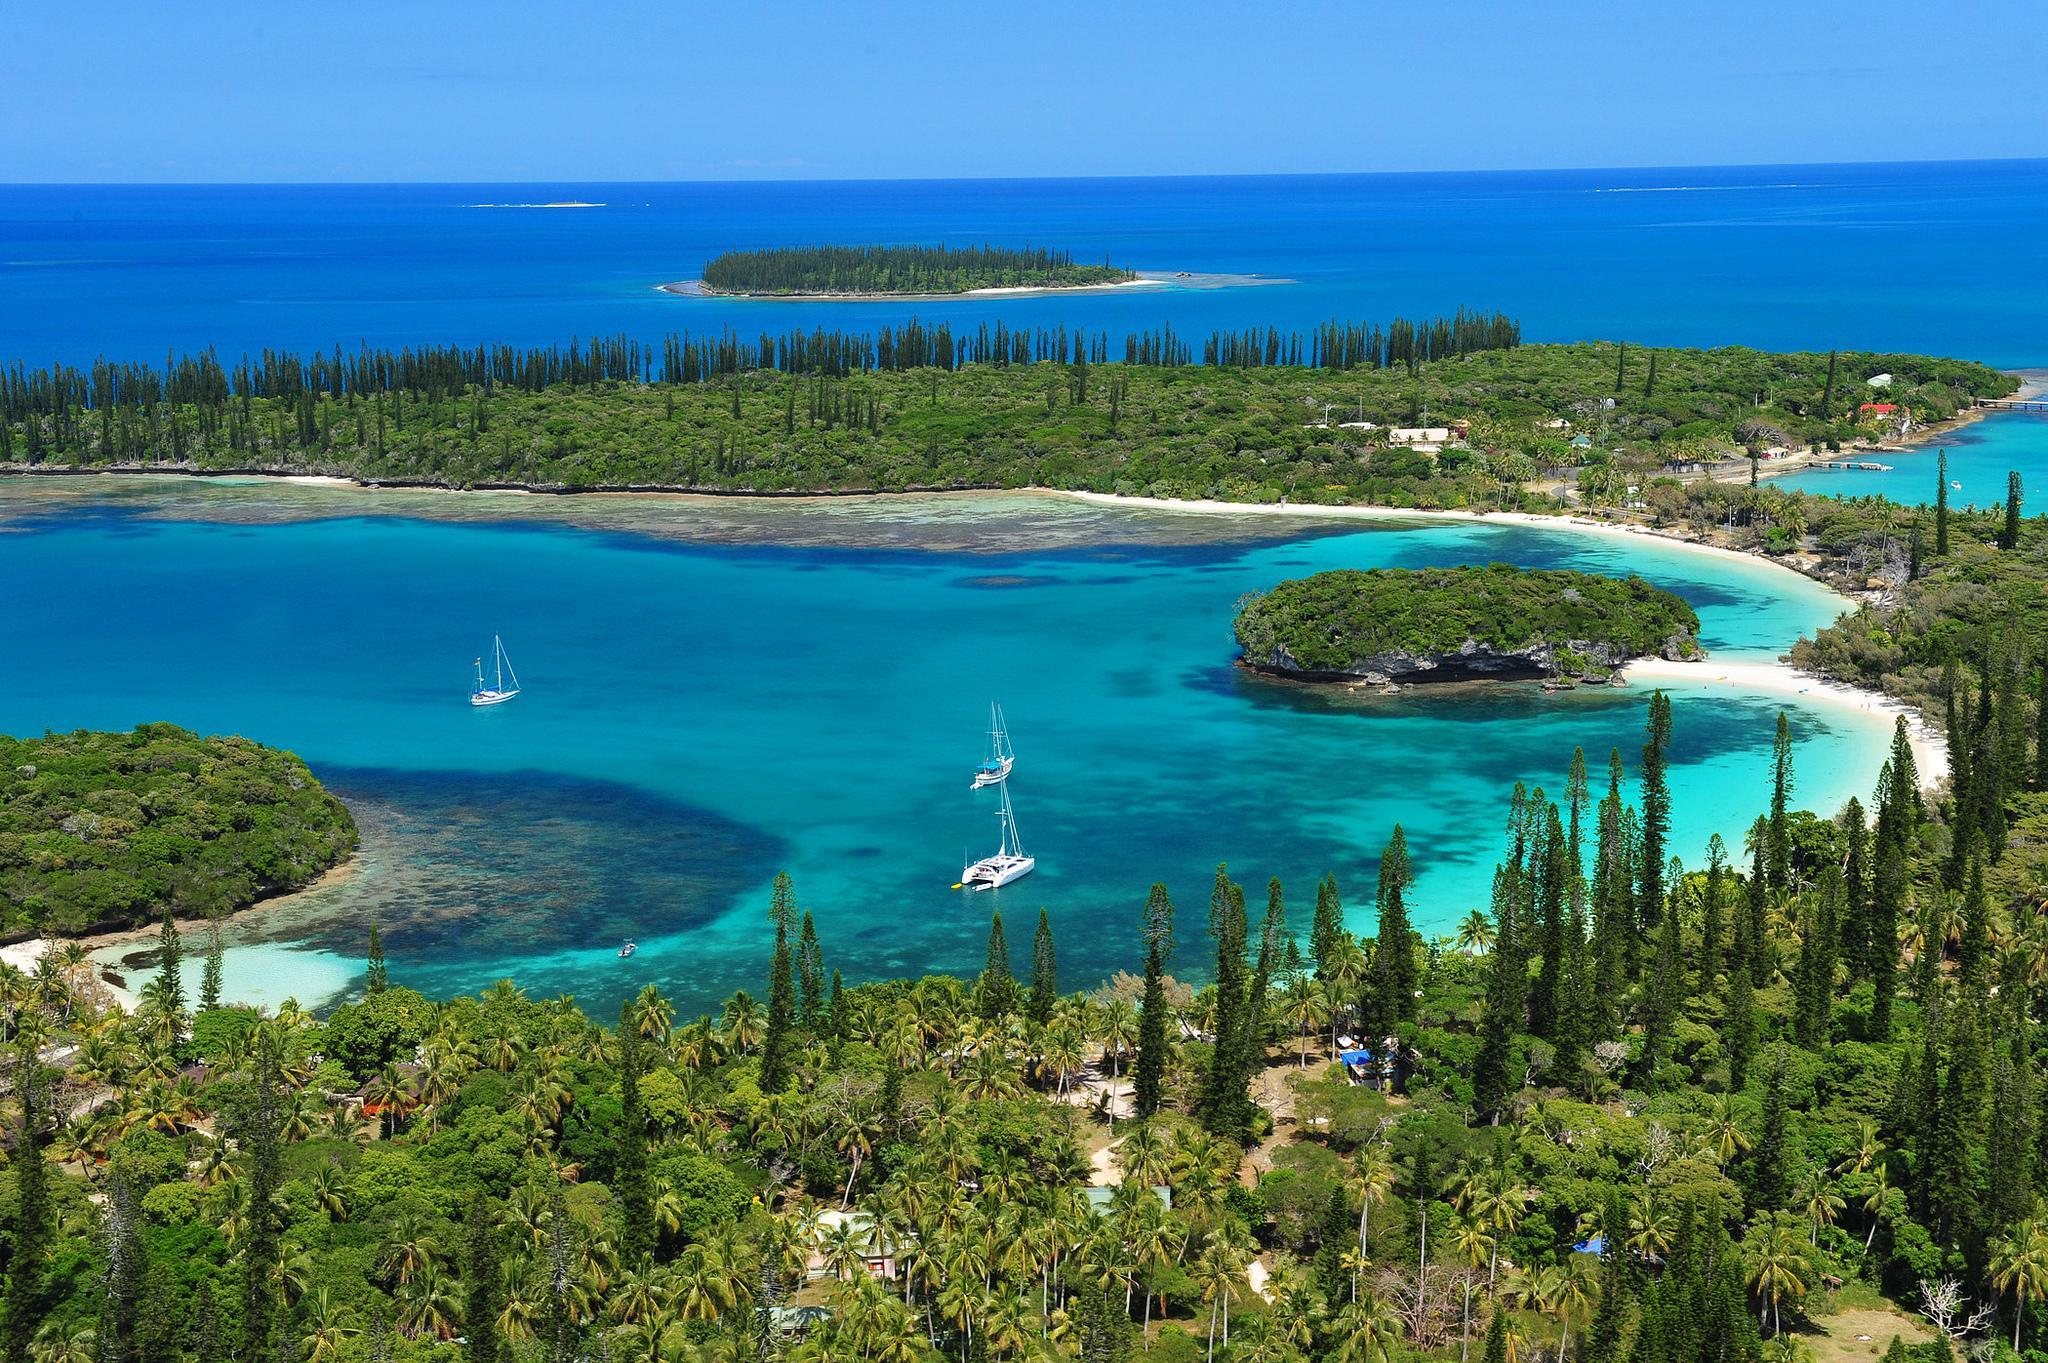 New Caledonia South Pacific HD desktop wallpaper Widescreen 2048x1363